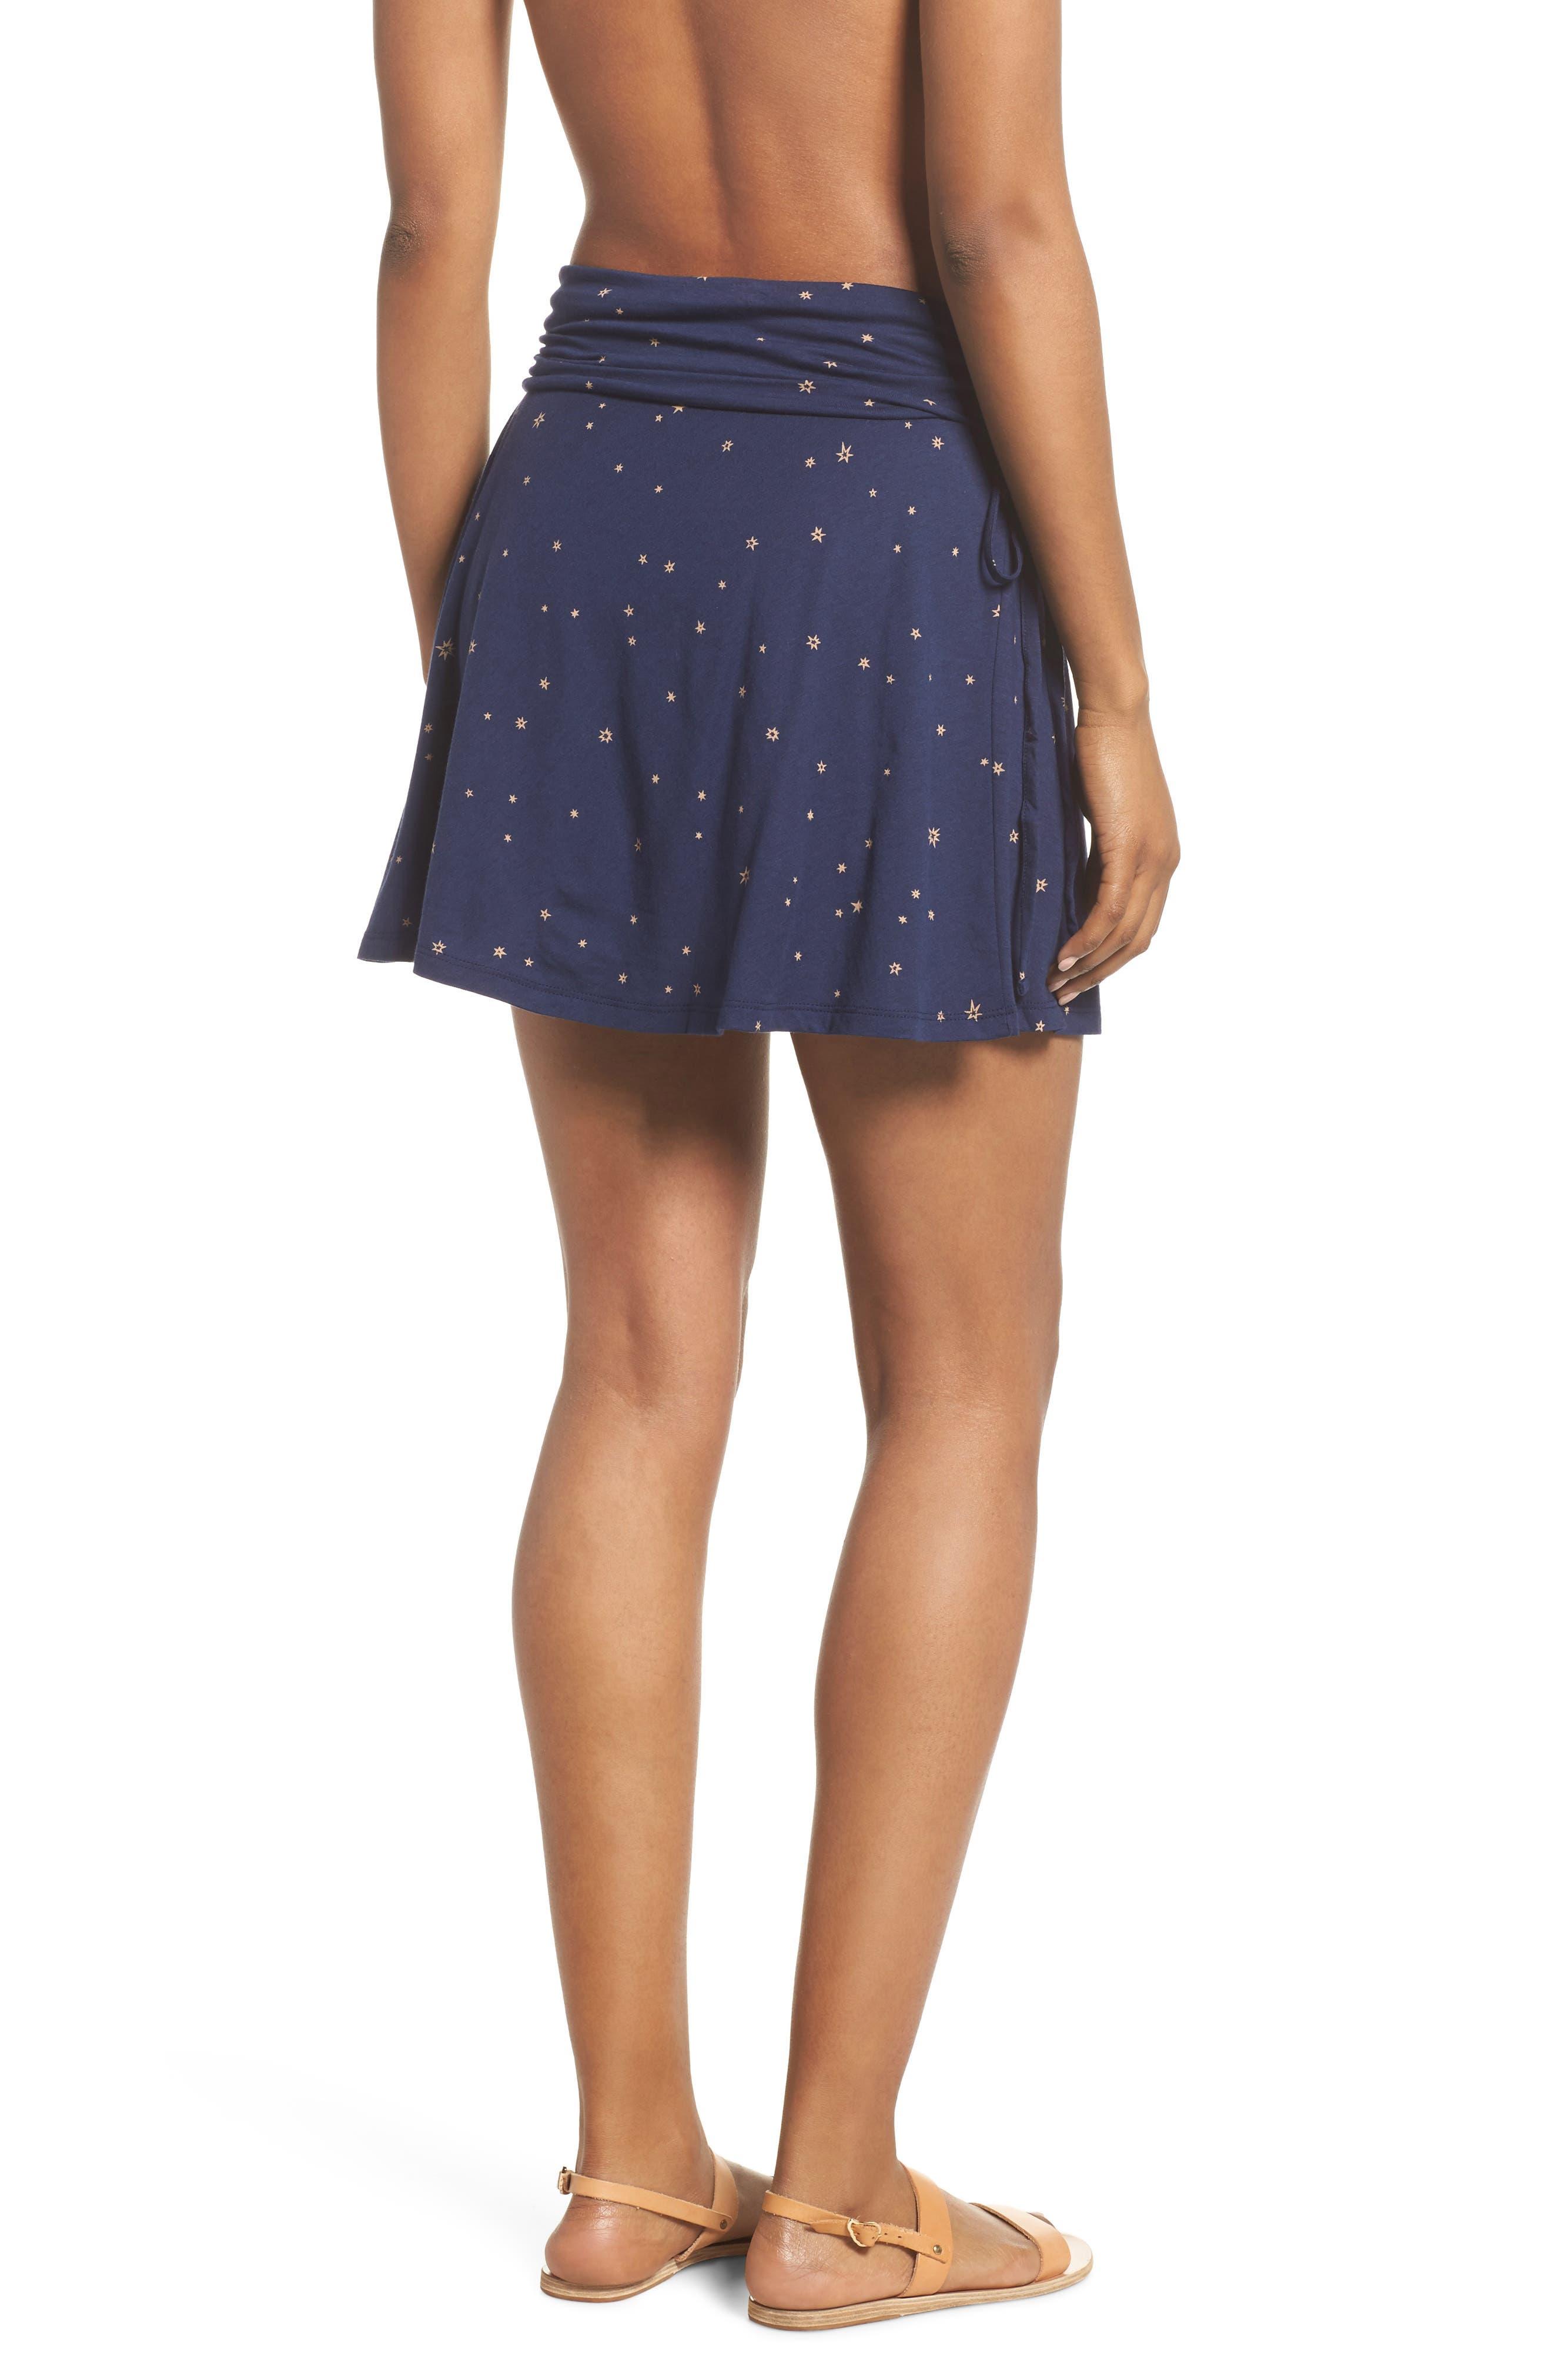 Lithia Cotton Blend Skirt,                             Alternate thumbnail 2, color,                             Micr Mica Pop Classic Navy